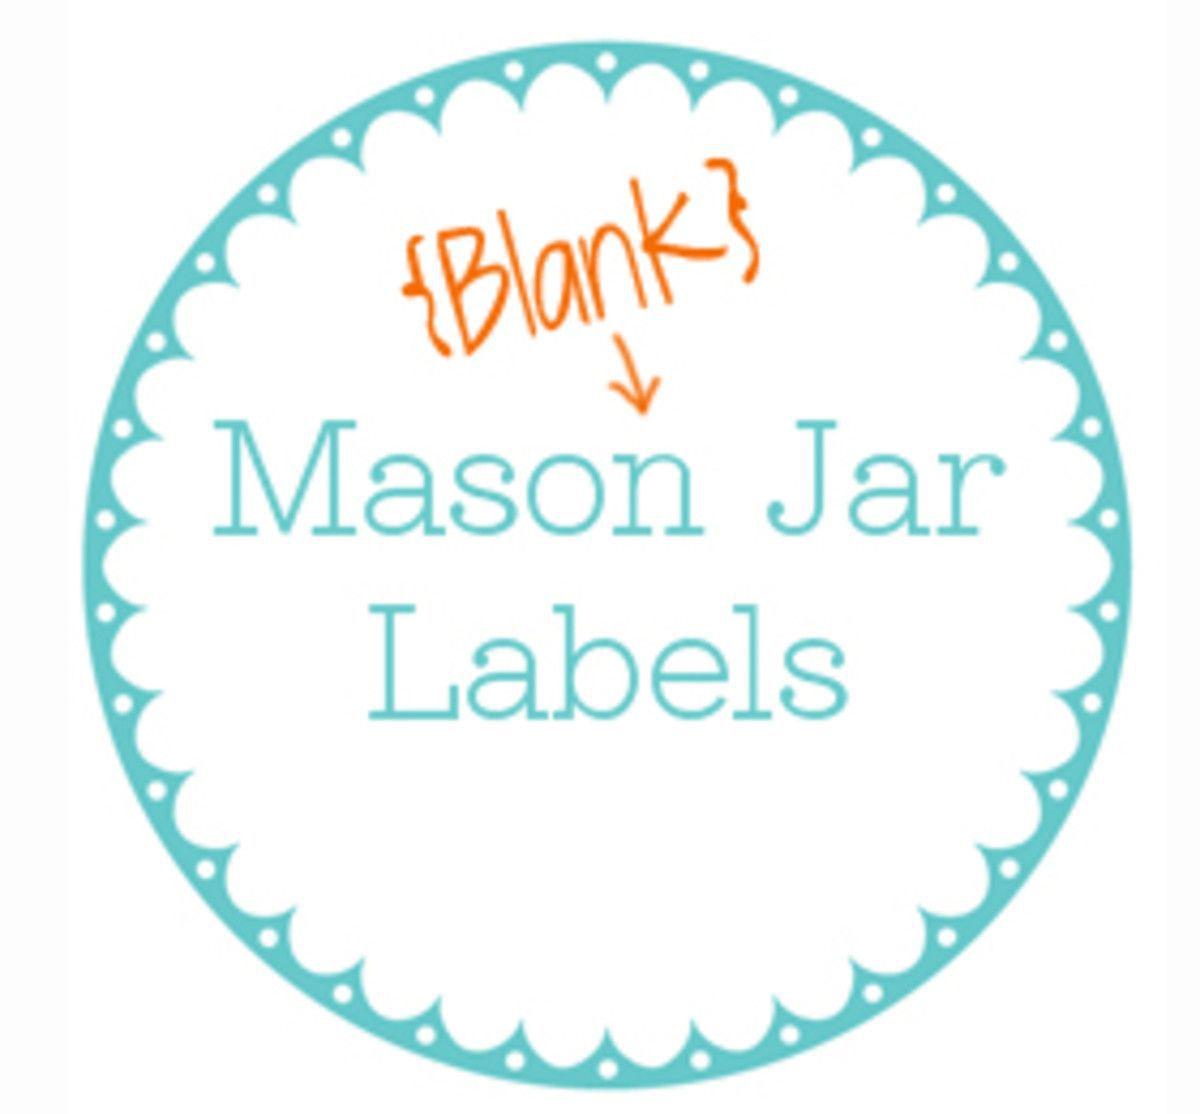 001 Outstanding Mason Jar Label Template Idea  Word AveryFull